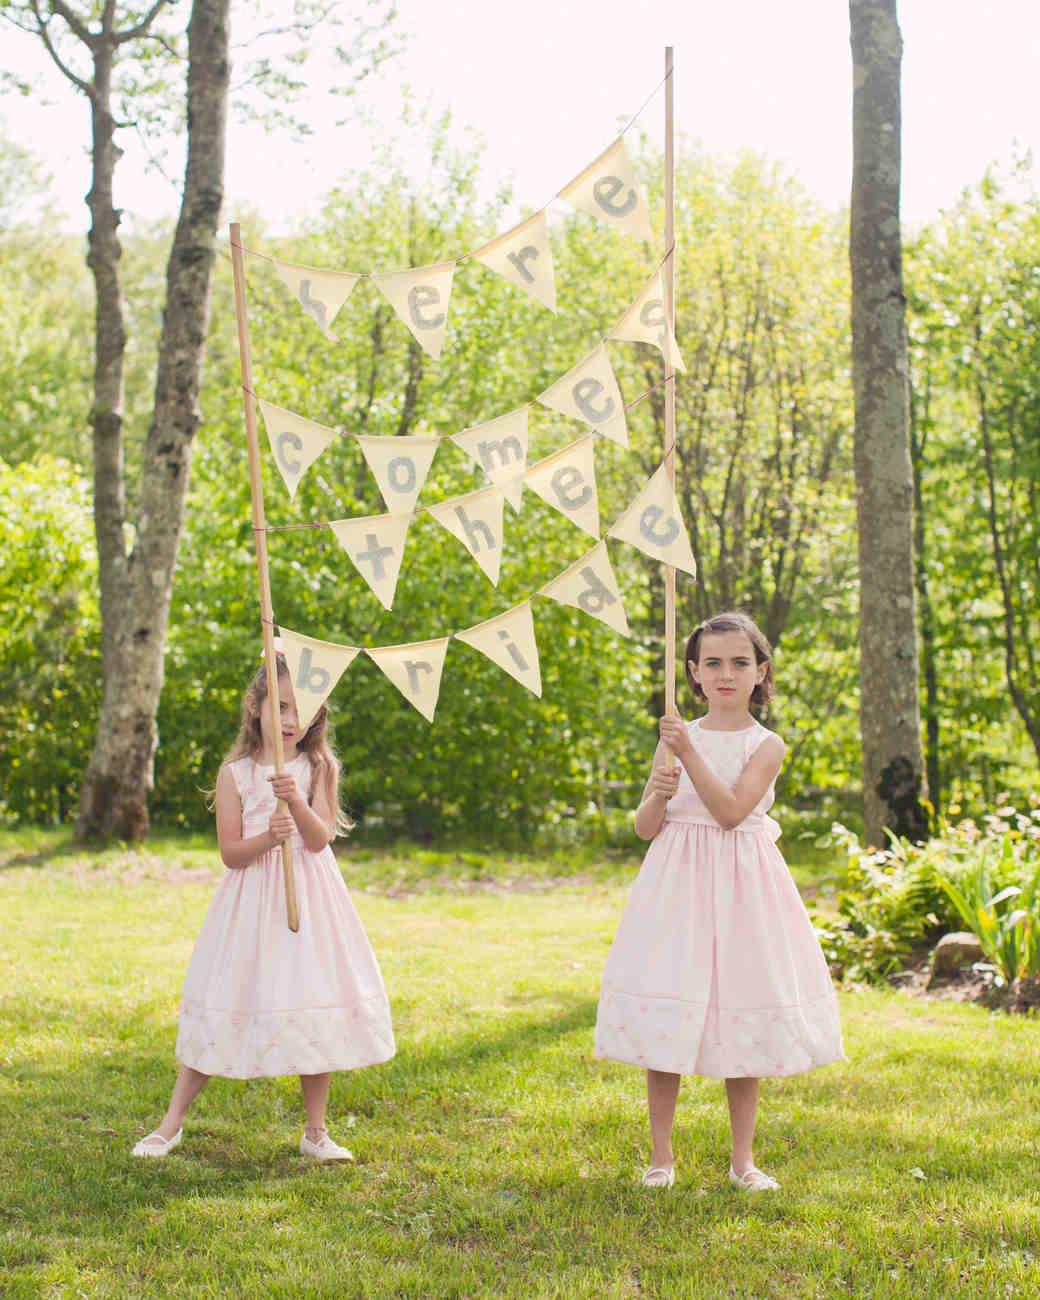 real-weddings-abby-julian-0711-239.jpg